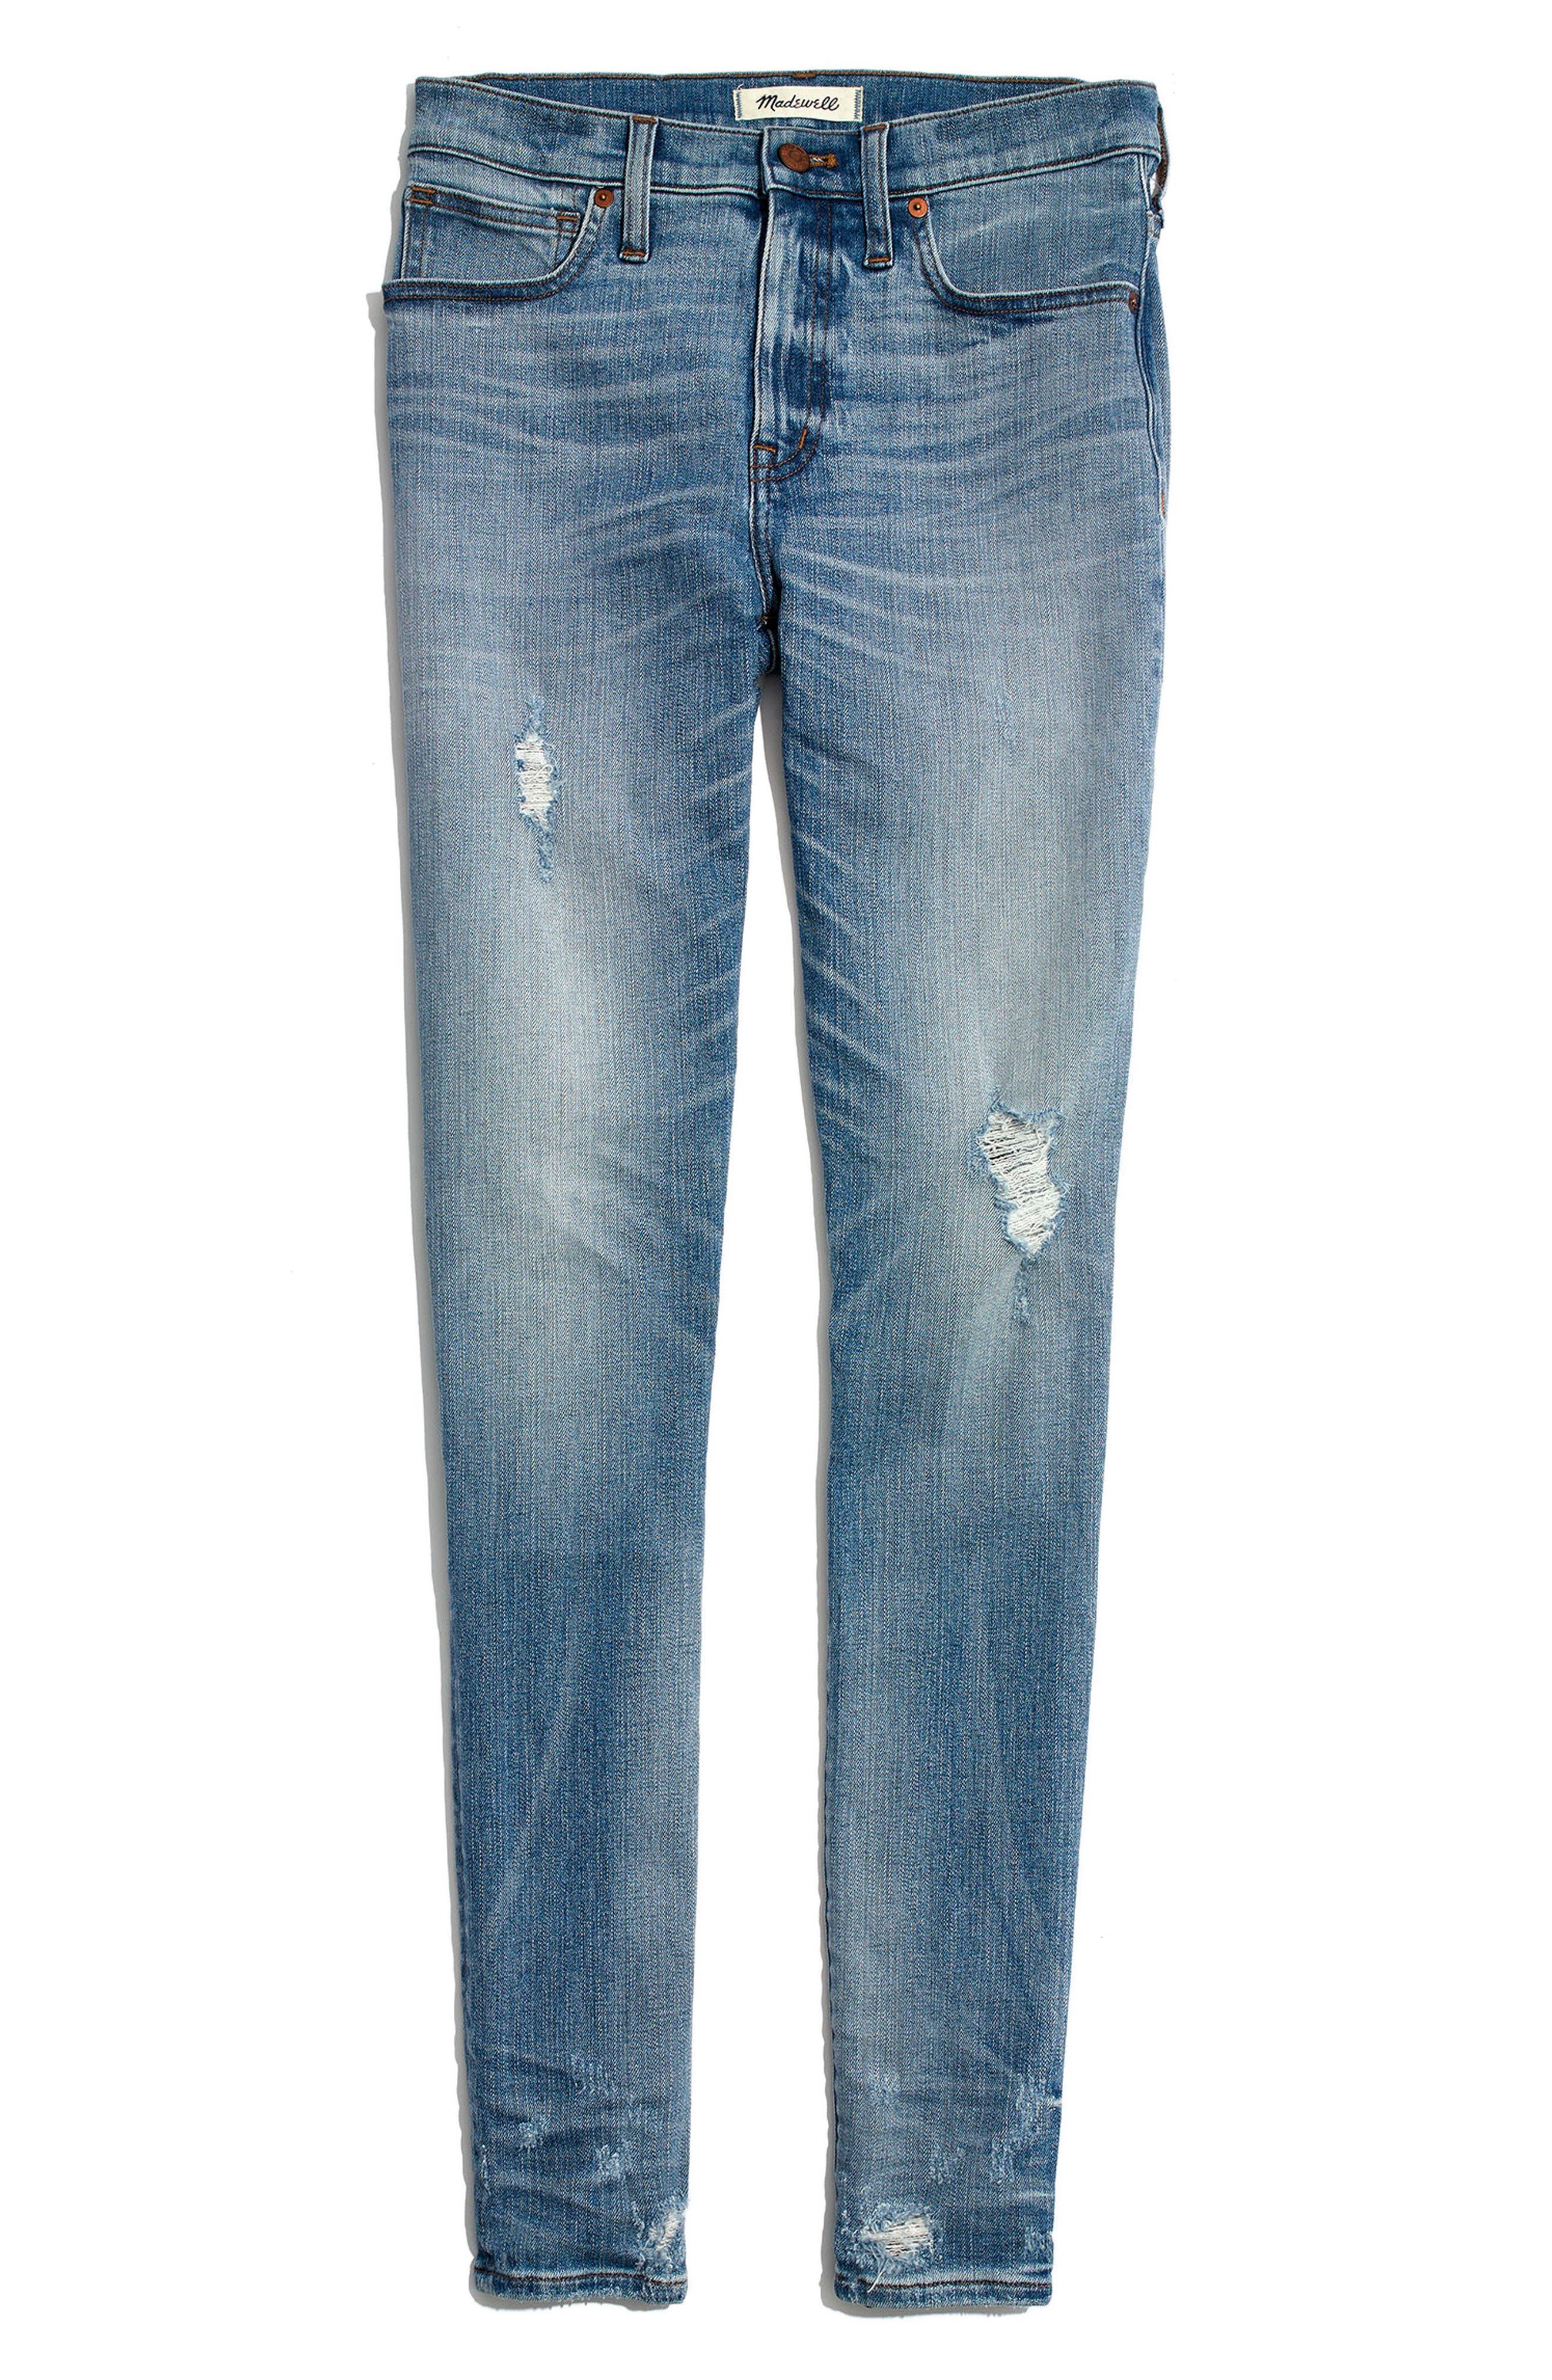 9-Inch Destructed Hem High Waist Skinny Jeans,                             Alternate thumbnail 5, color,                             Cliff Wash